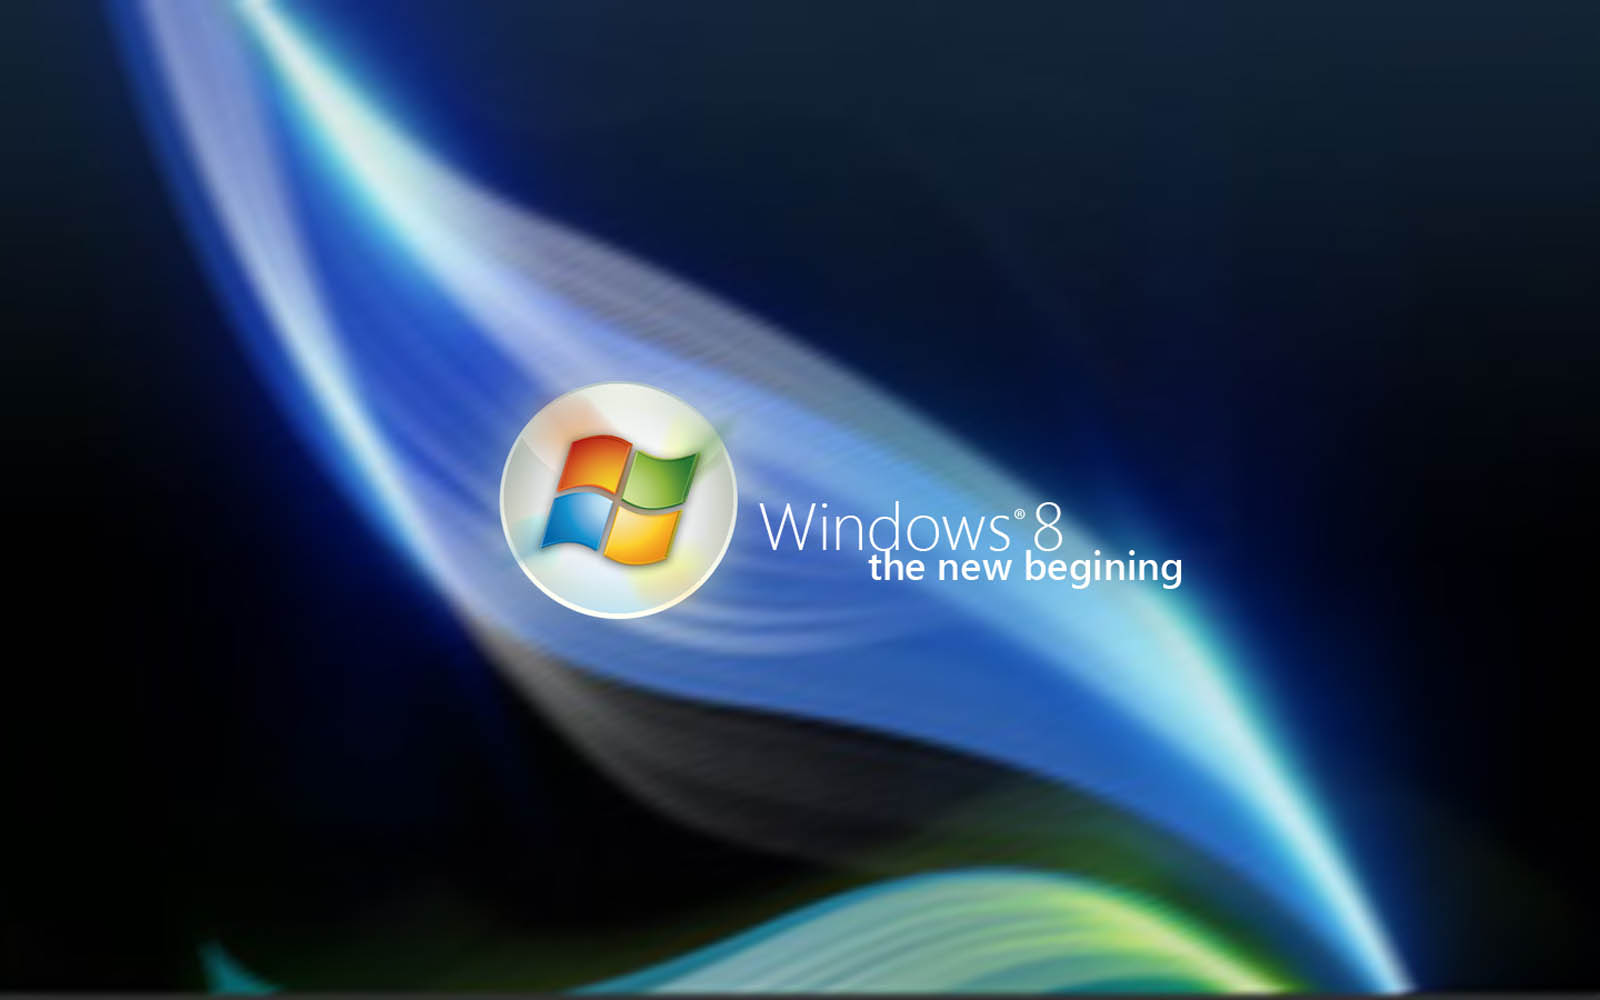 Gallery mangklex windows 8 desktop wallpapers and backgrounds - Windows wallpaper themes free ...